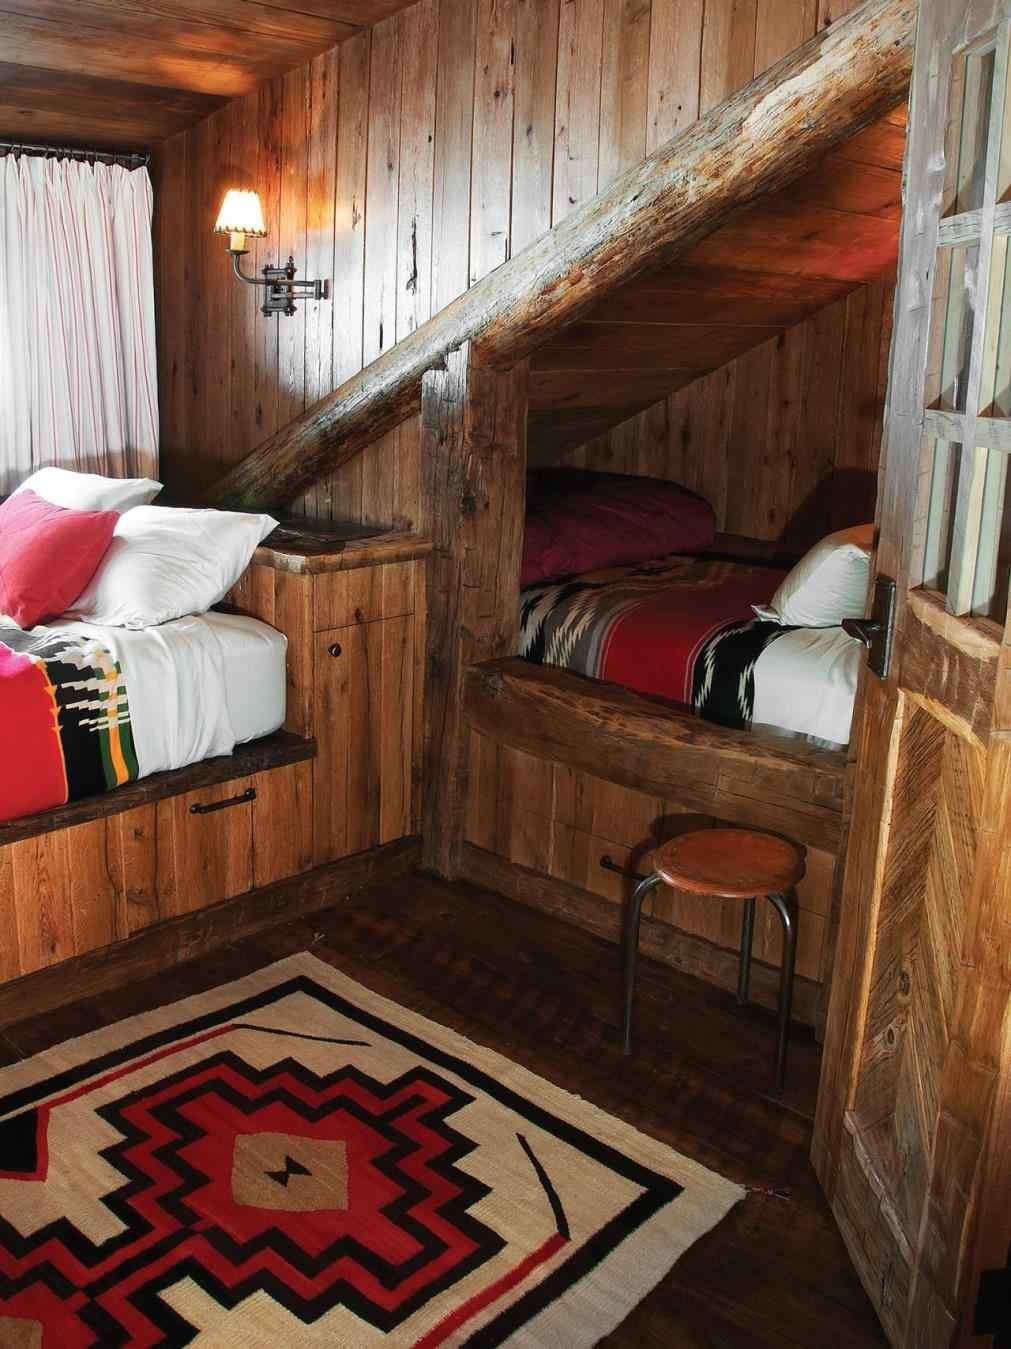 Log home interior ideas amazing  rustic log cabin interiors for comfortable cabin ideas